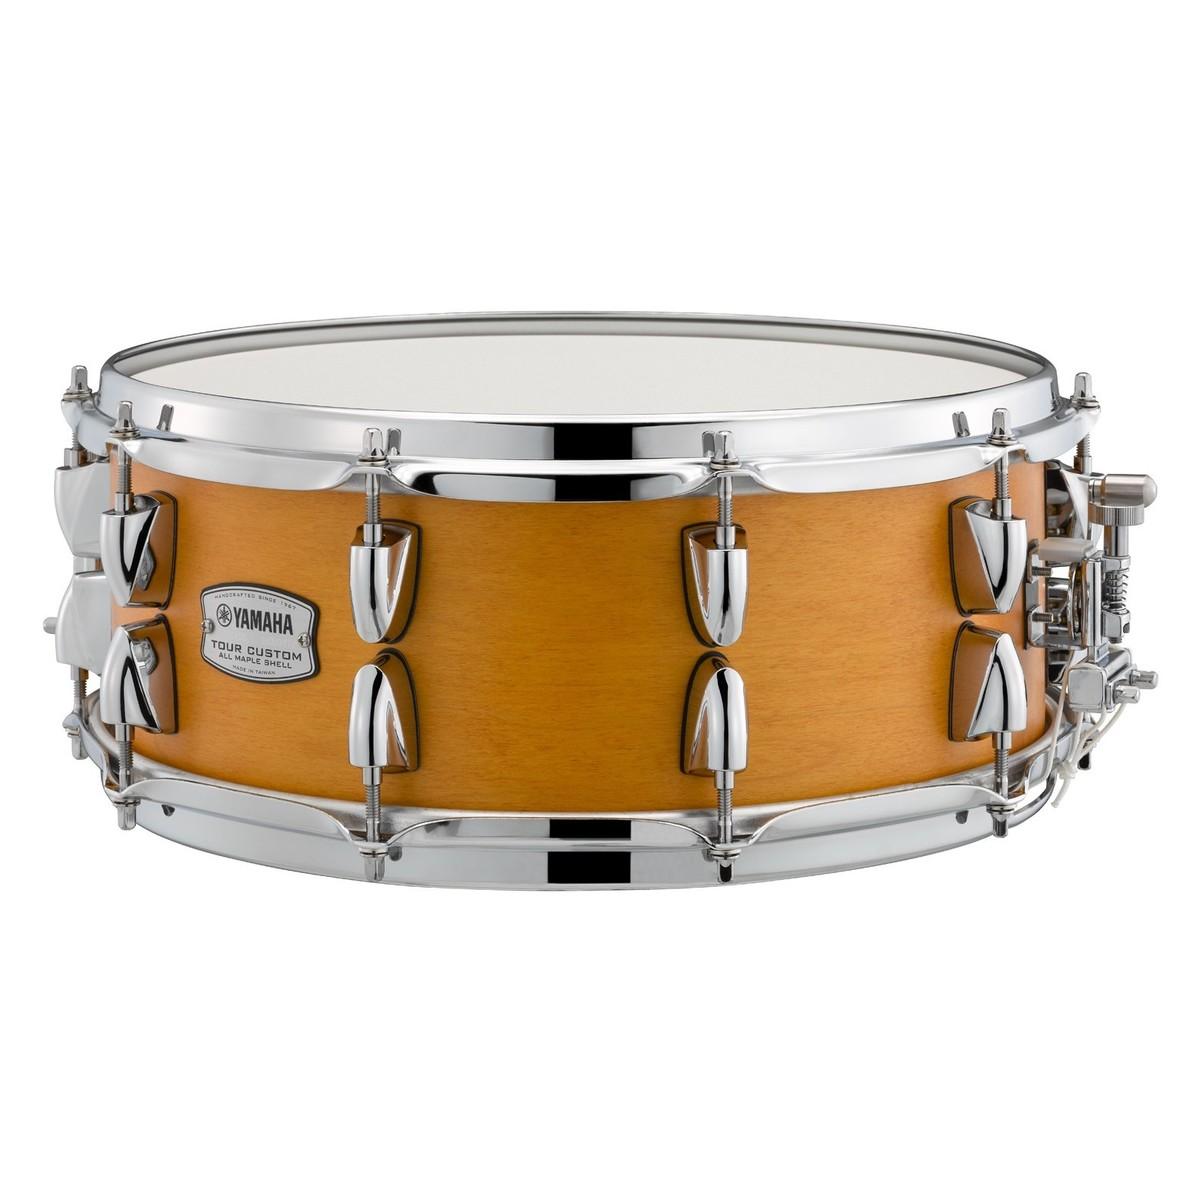 yamaha tour custom 14 x 5 5 39 39 snare drum caramel satin at gear4music. Black Bedroom Furniture Sets. Home Design Ideas